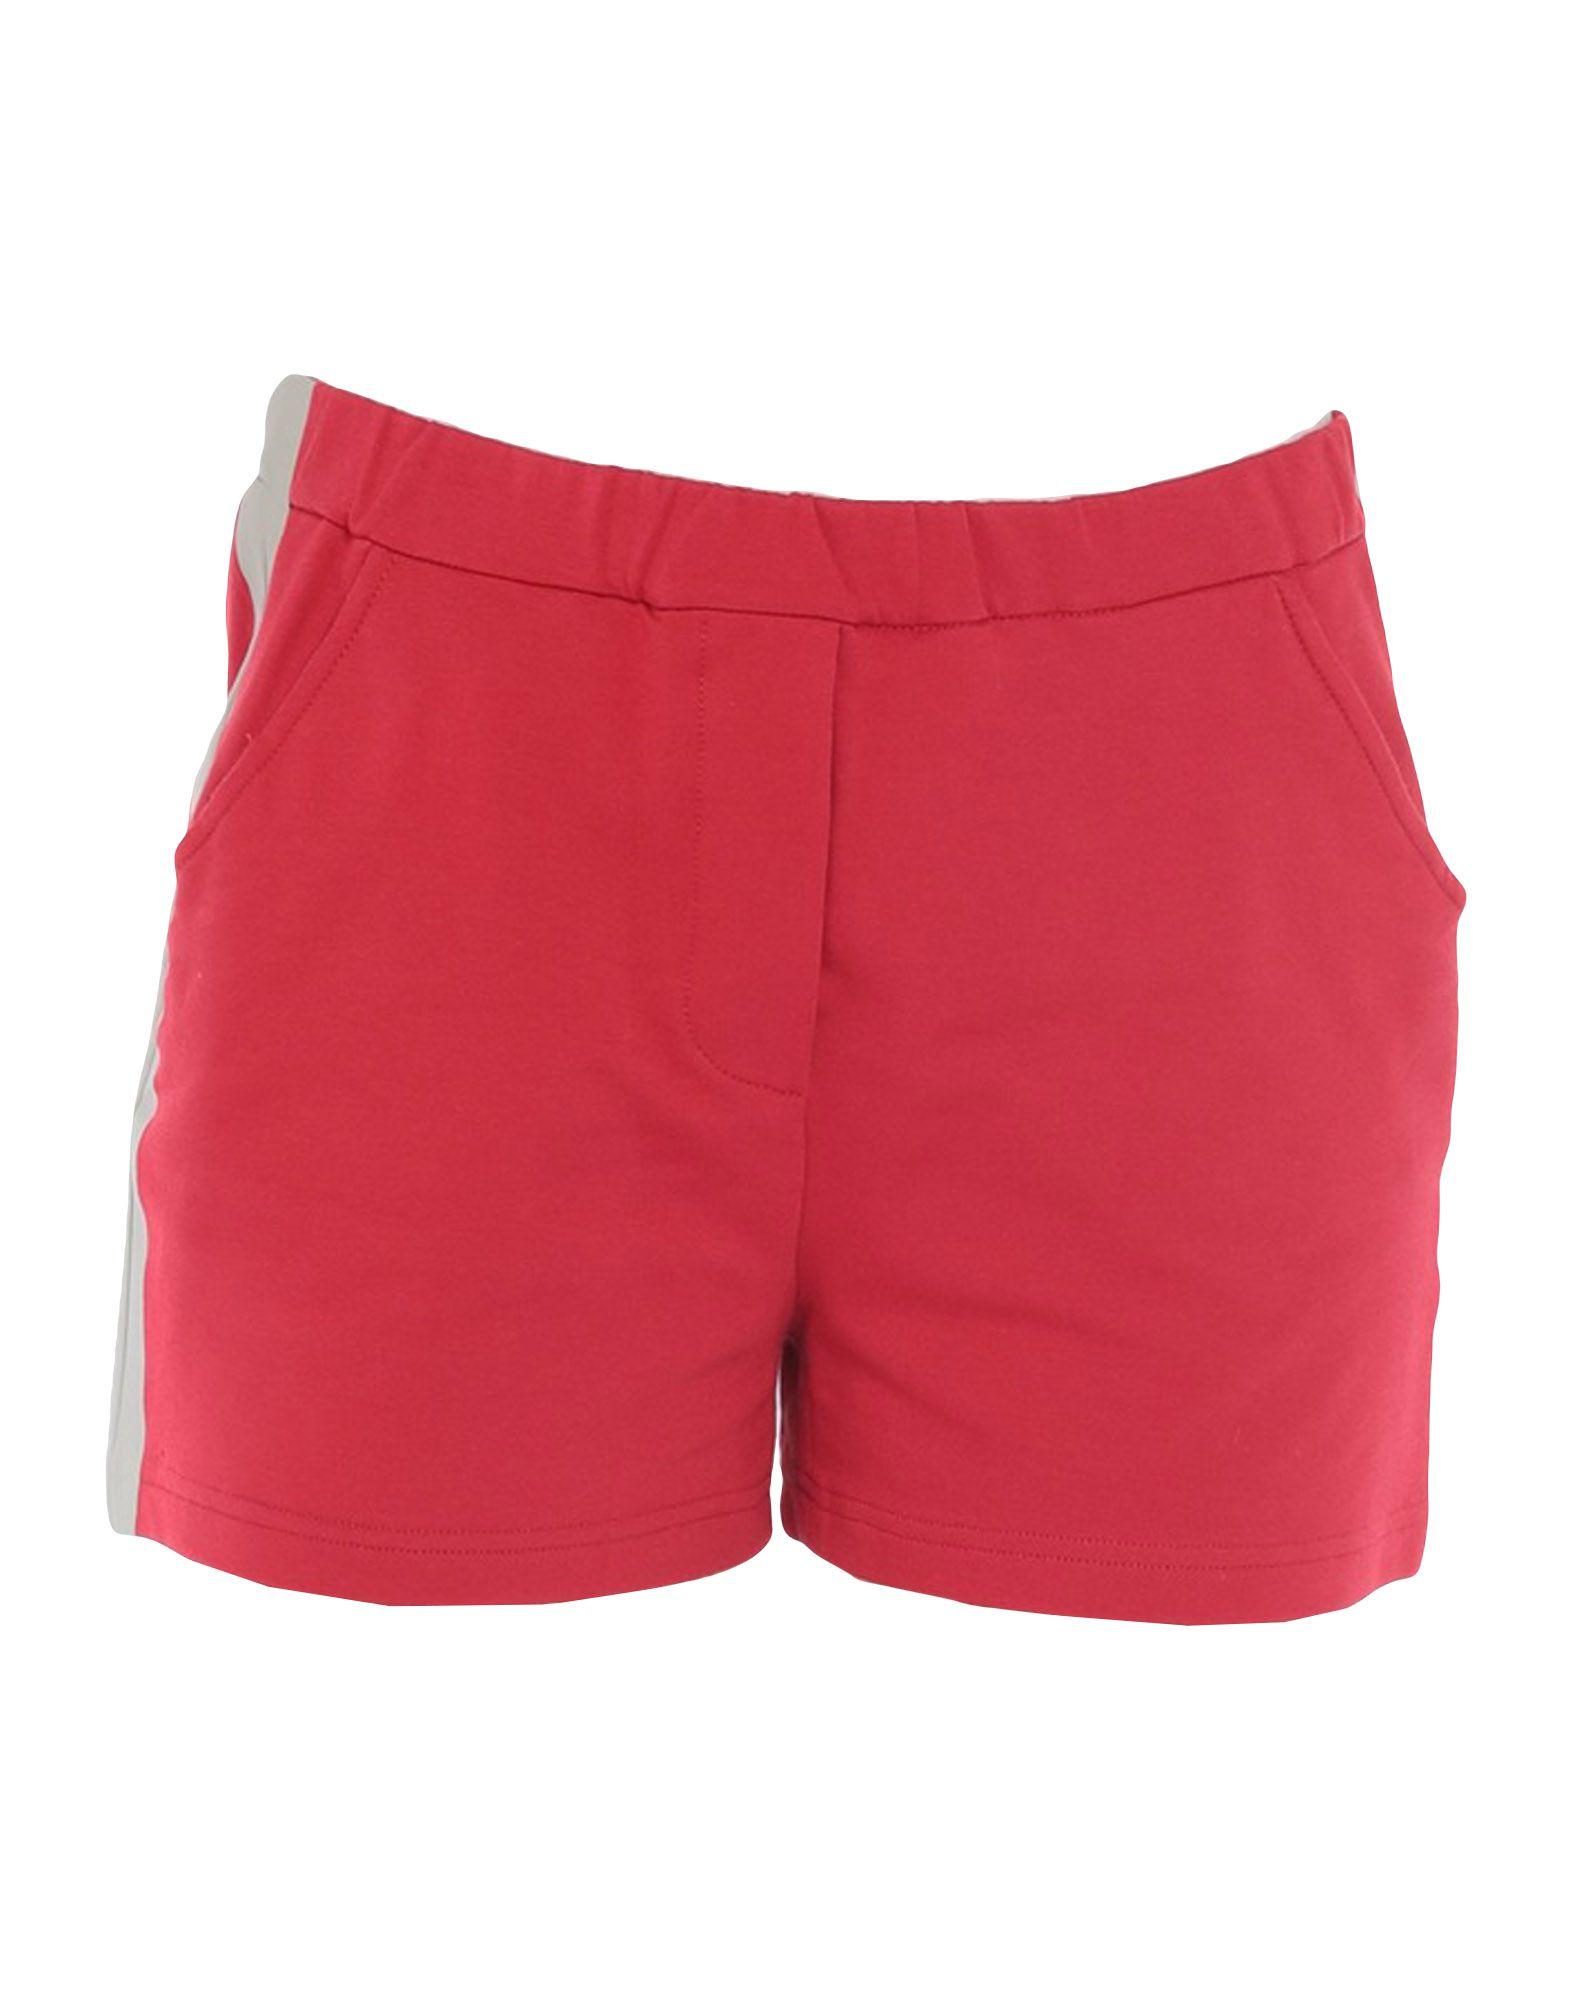 DOUUOD KIDS | DOUUOD Shorts 13271901 | Goxip